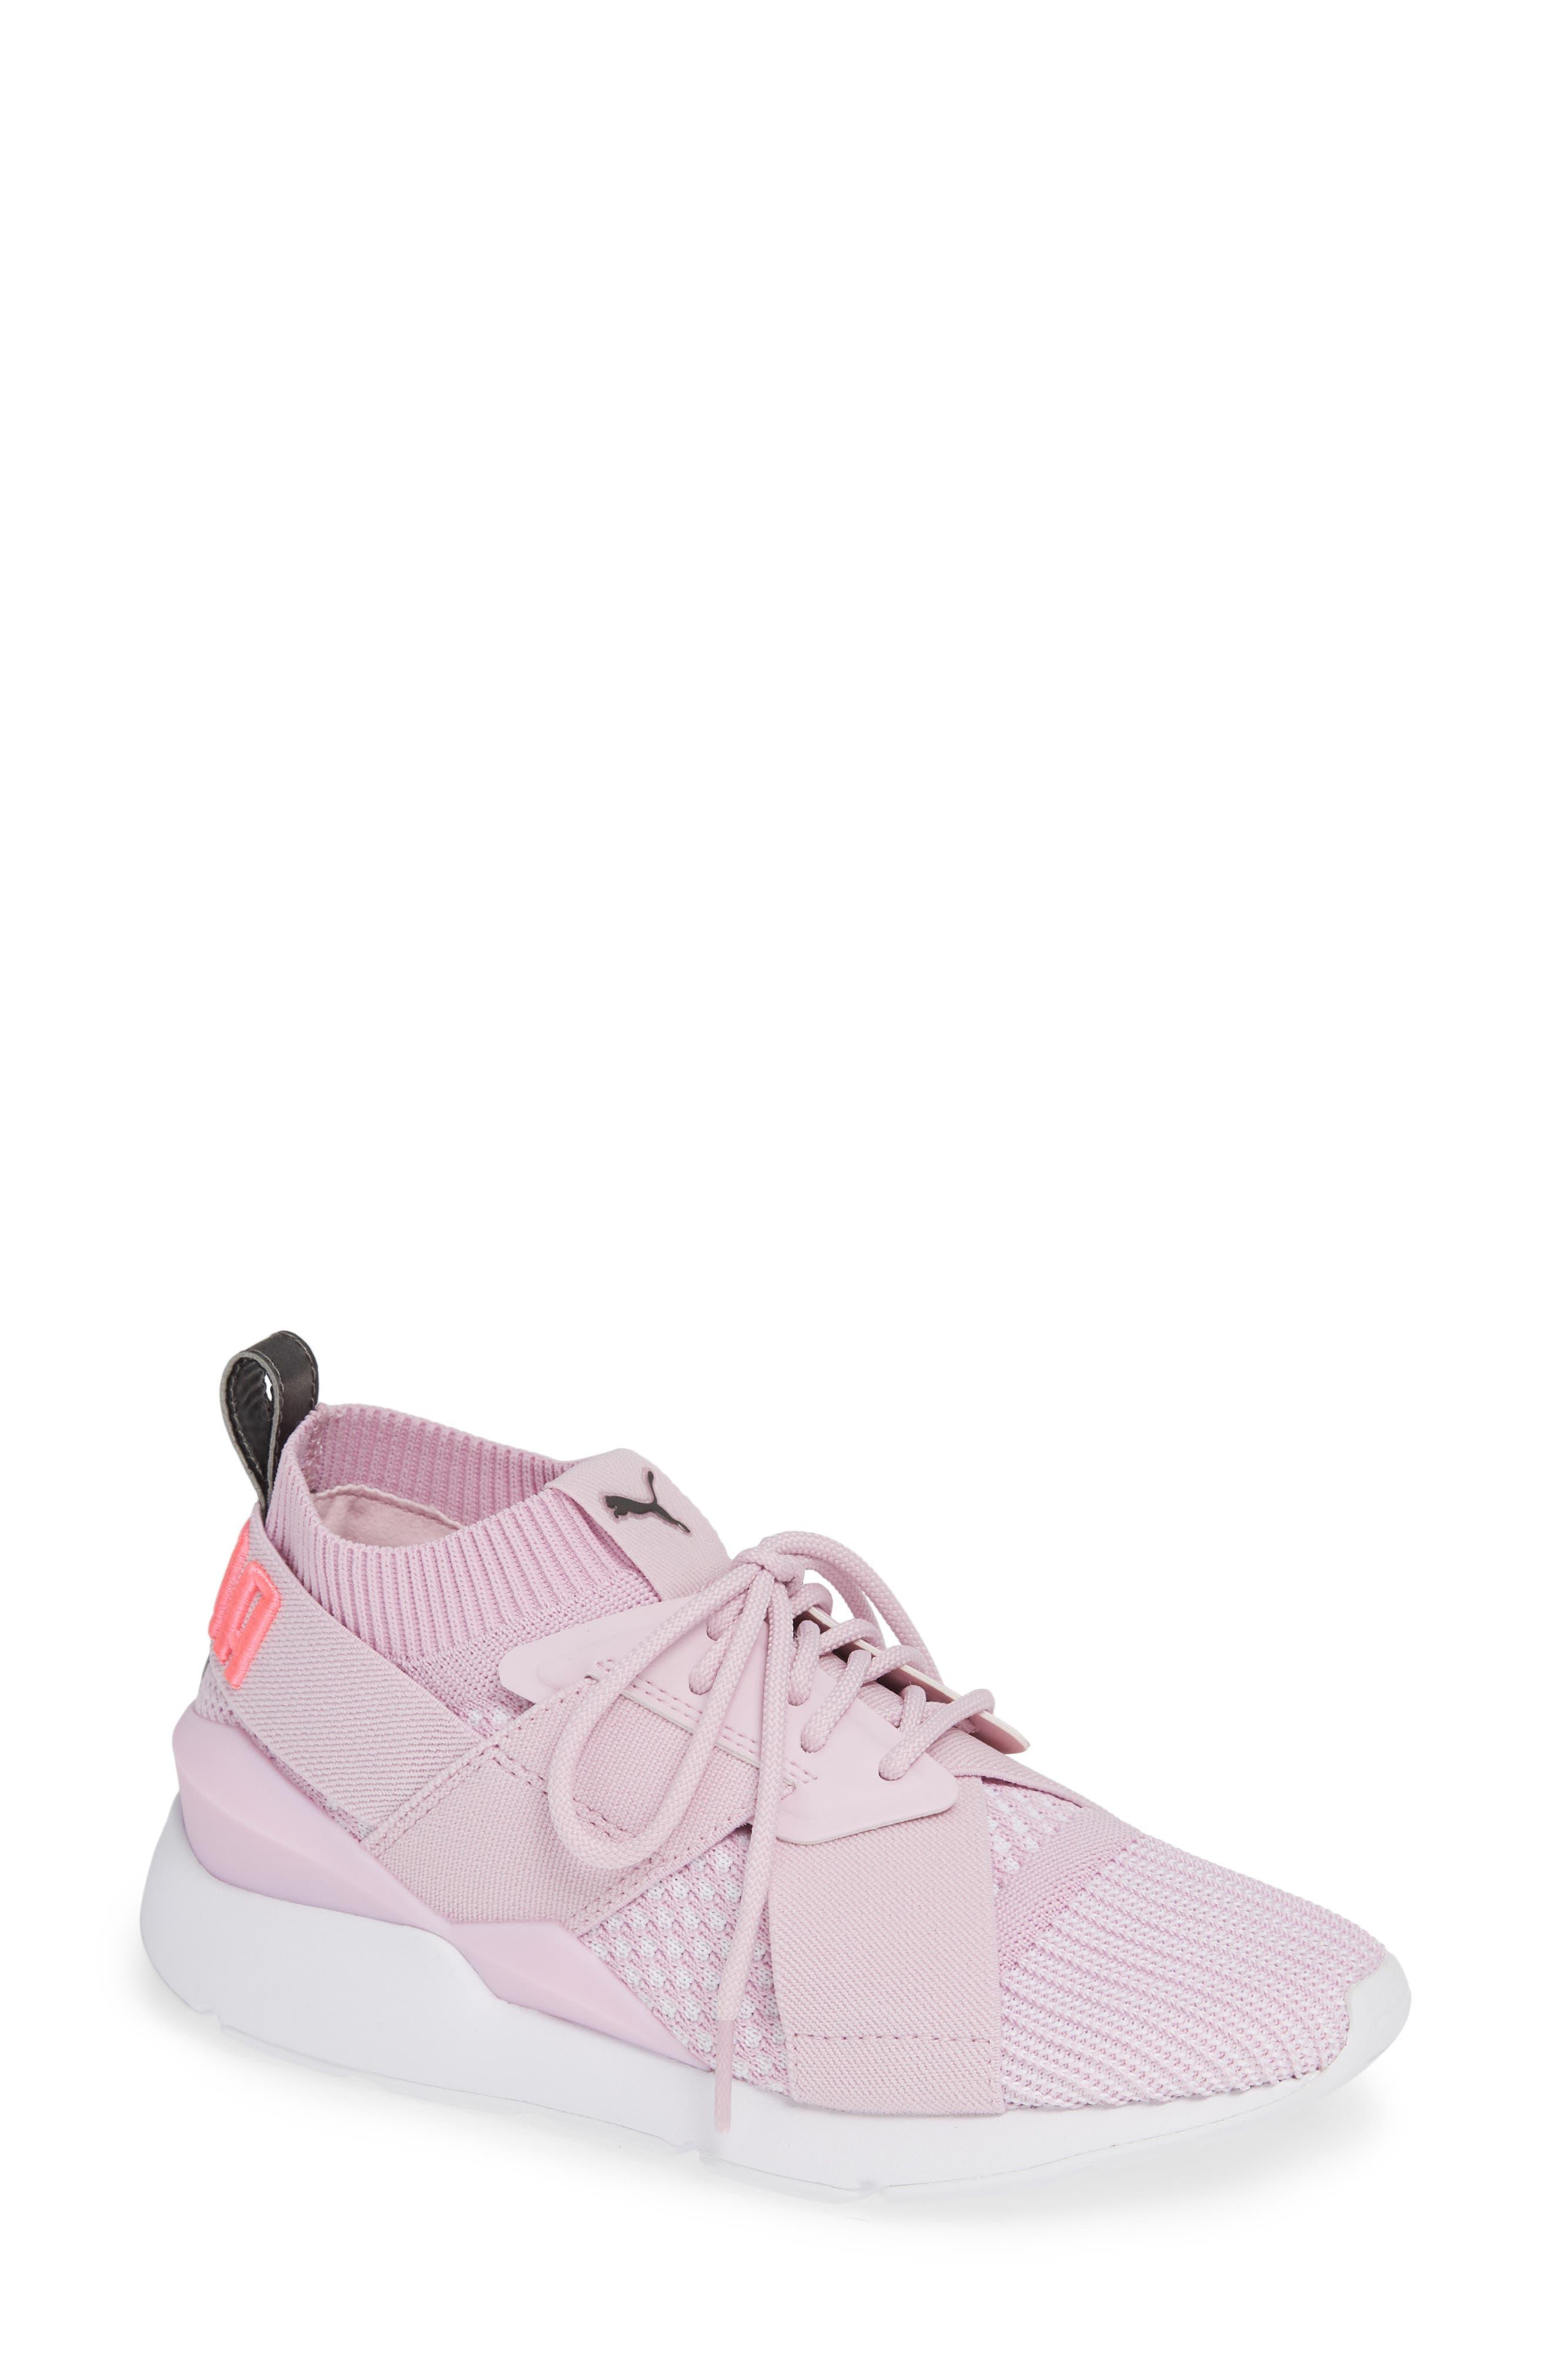 Womens Puma Sale Nordstrom Anya Living Rs 004 5t Shoe Rack Grey